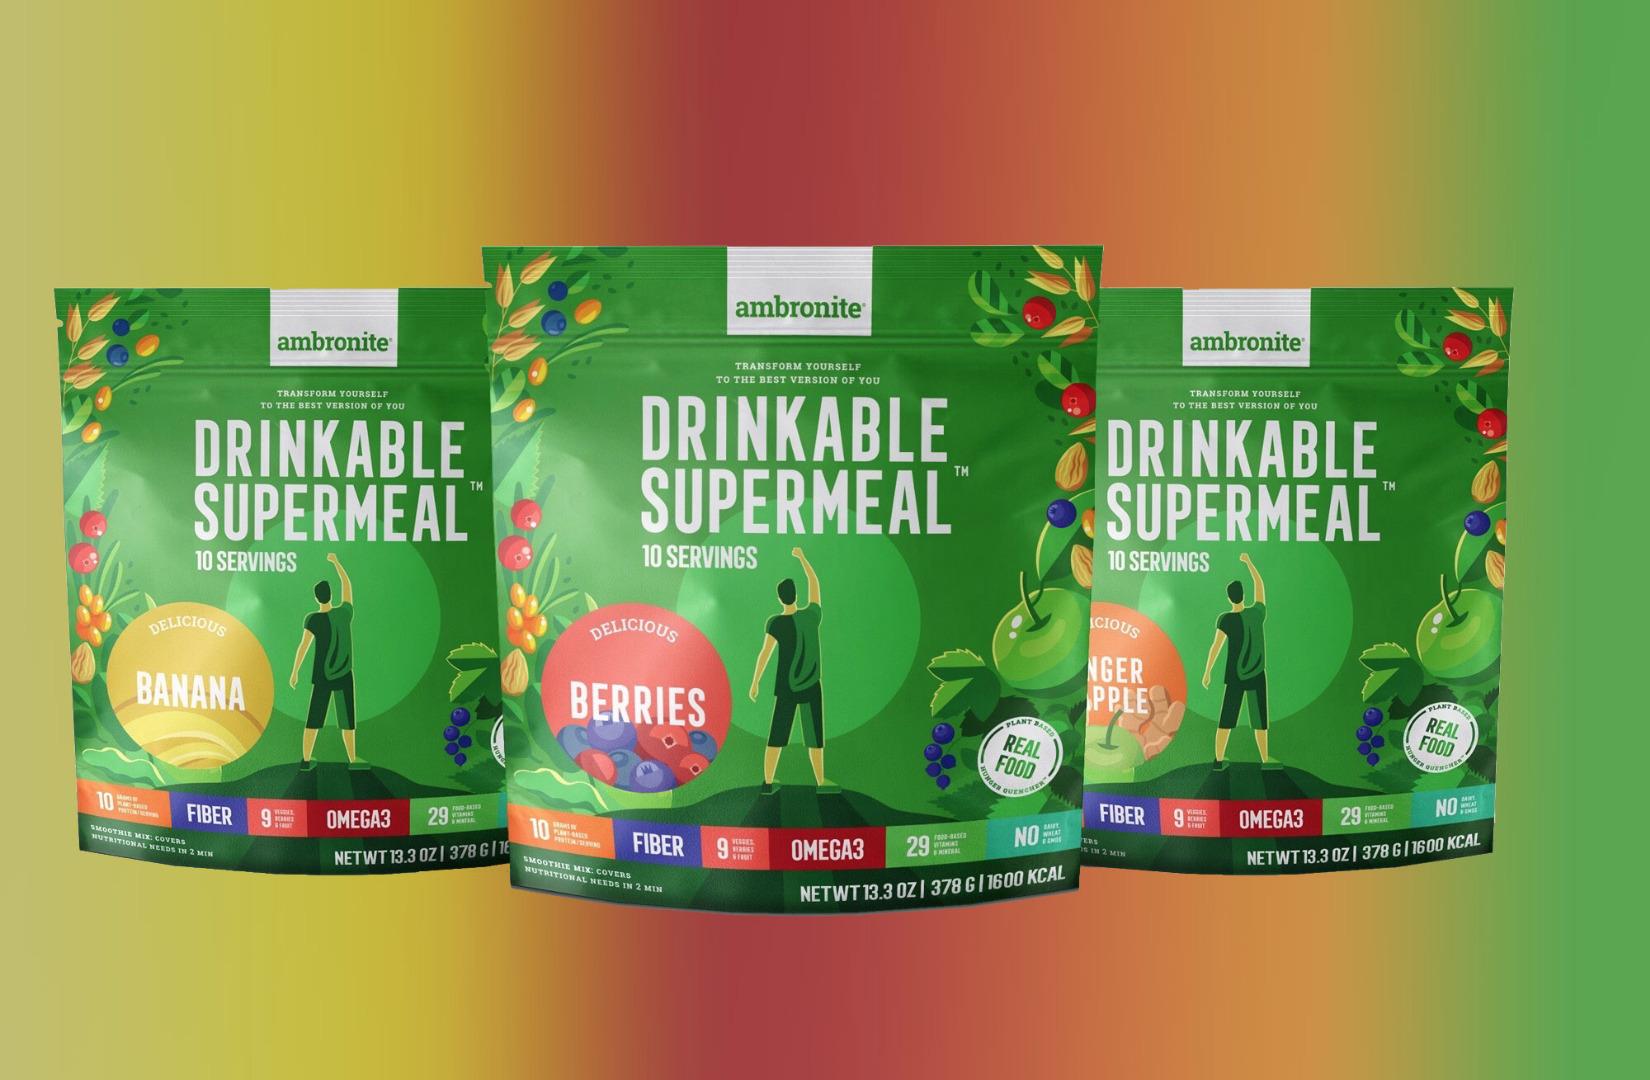 Ambronite 3-Flavor Bundle Subscription 16% off